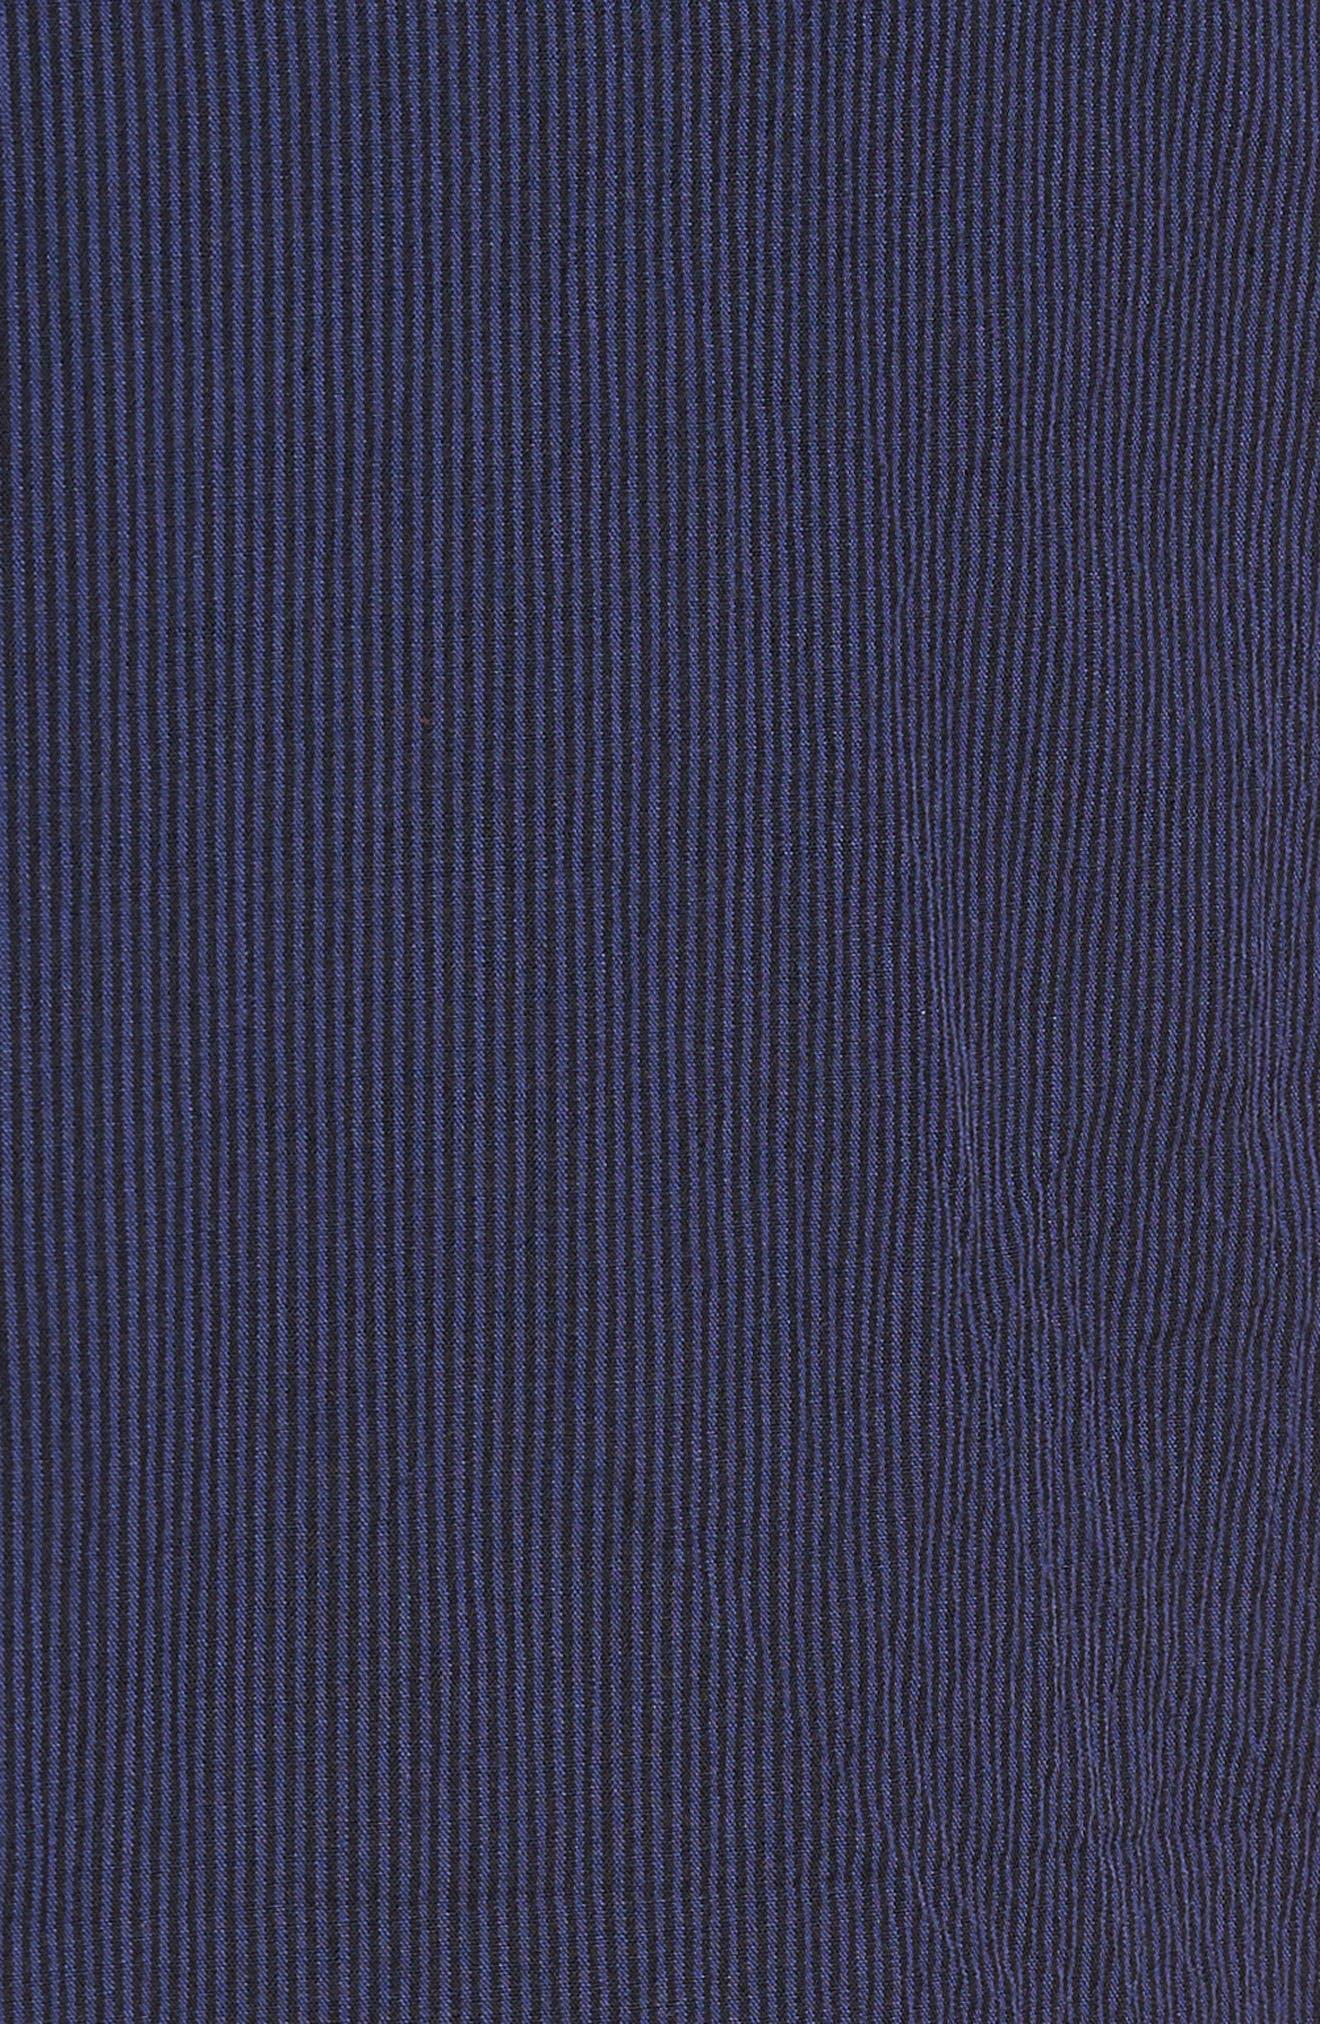 Dagger Flat Front Seersucker Trousers,                             Alternate thumbnail 5, color,                             400